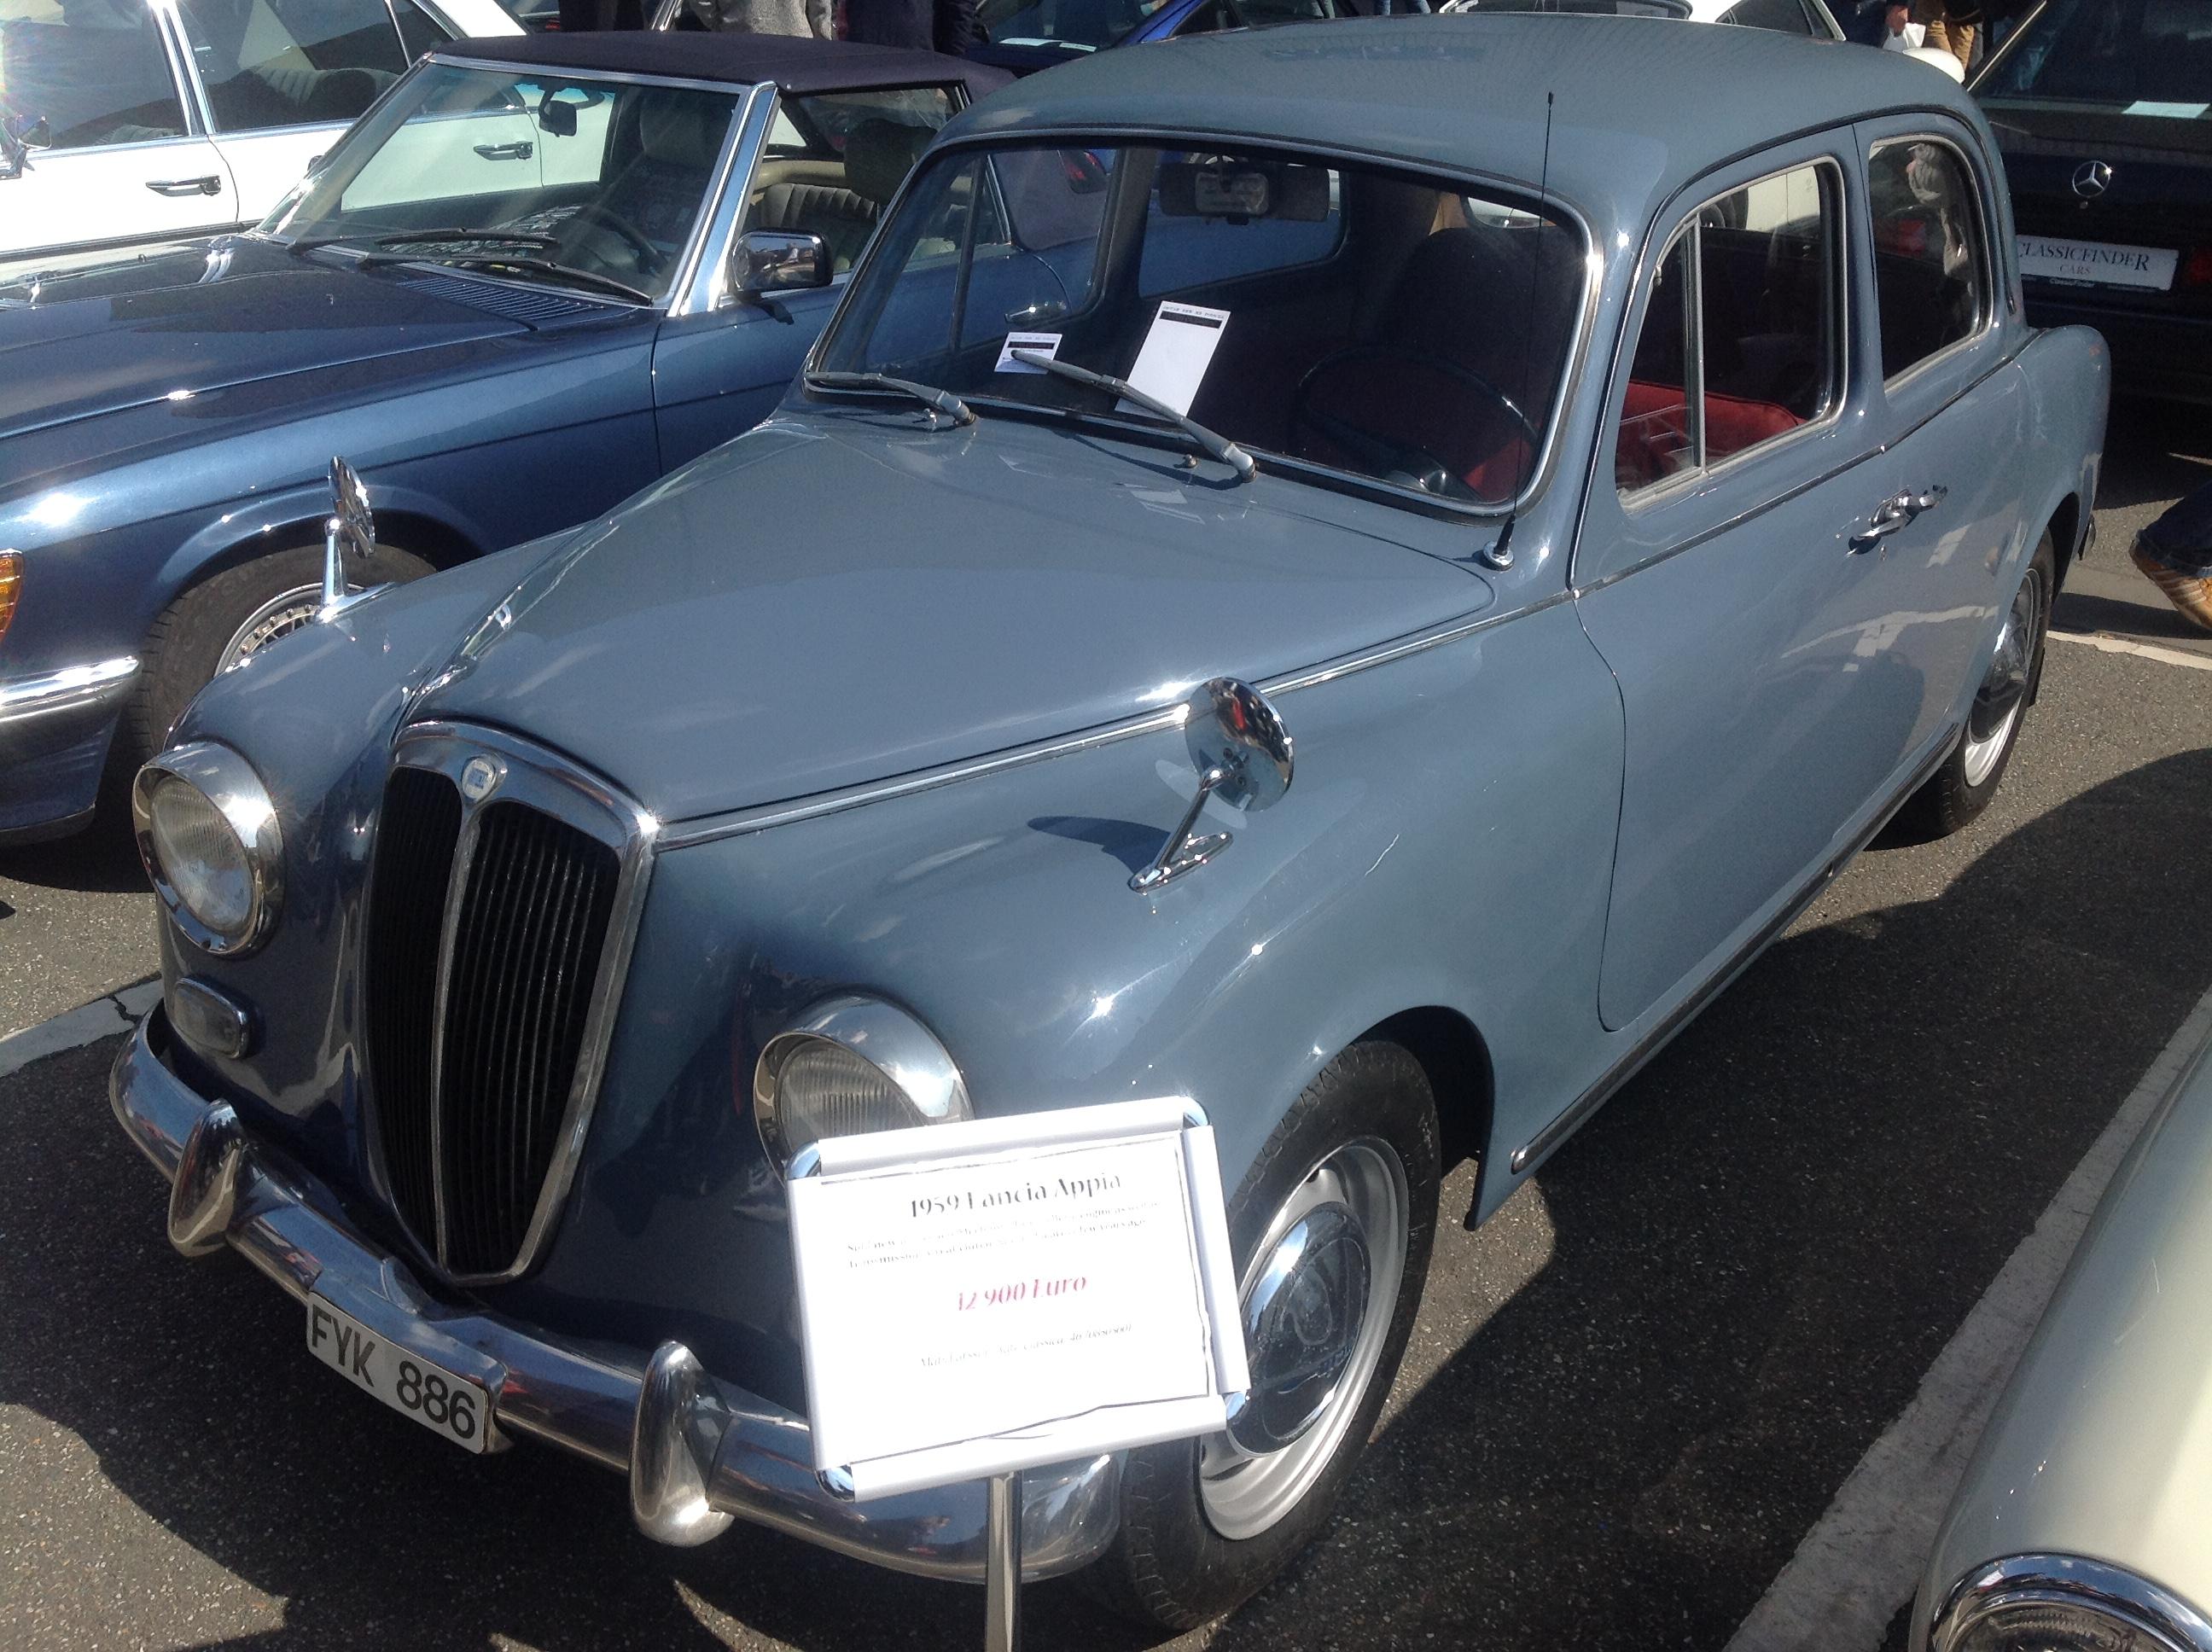 File:Lancia Appia Series II (1959) (25899992183).jpg - Wikimedia Commons